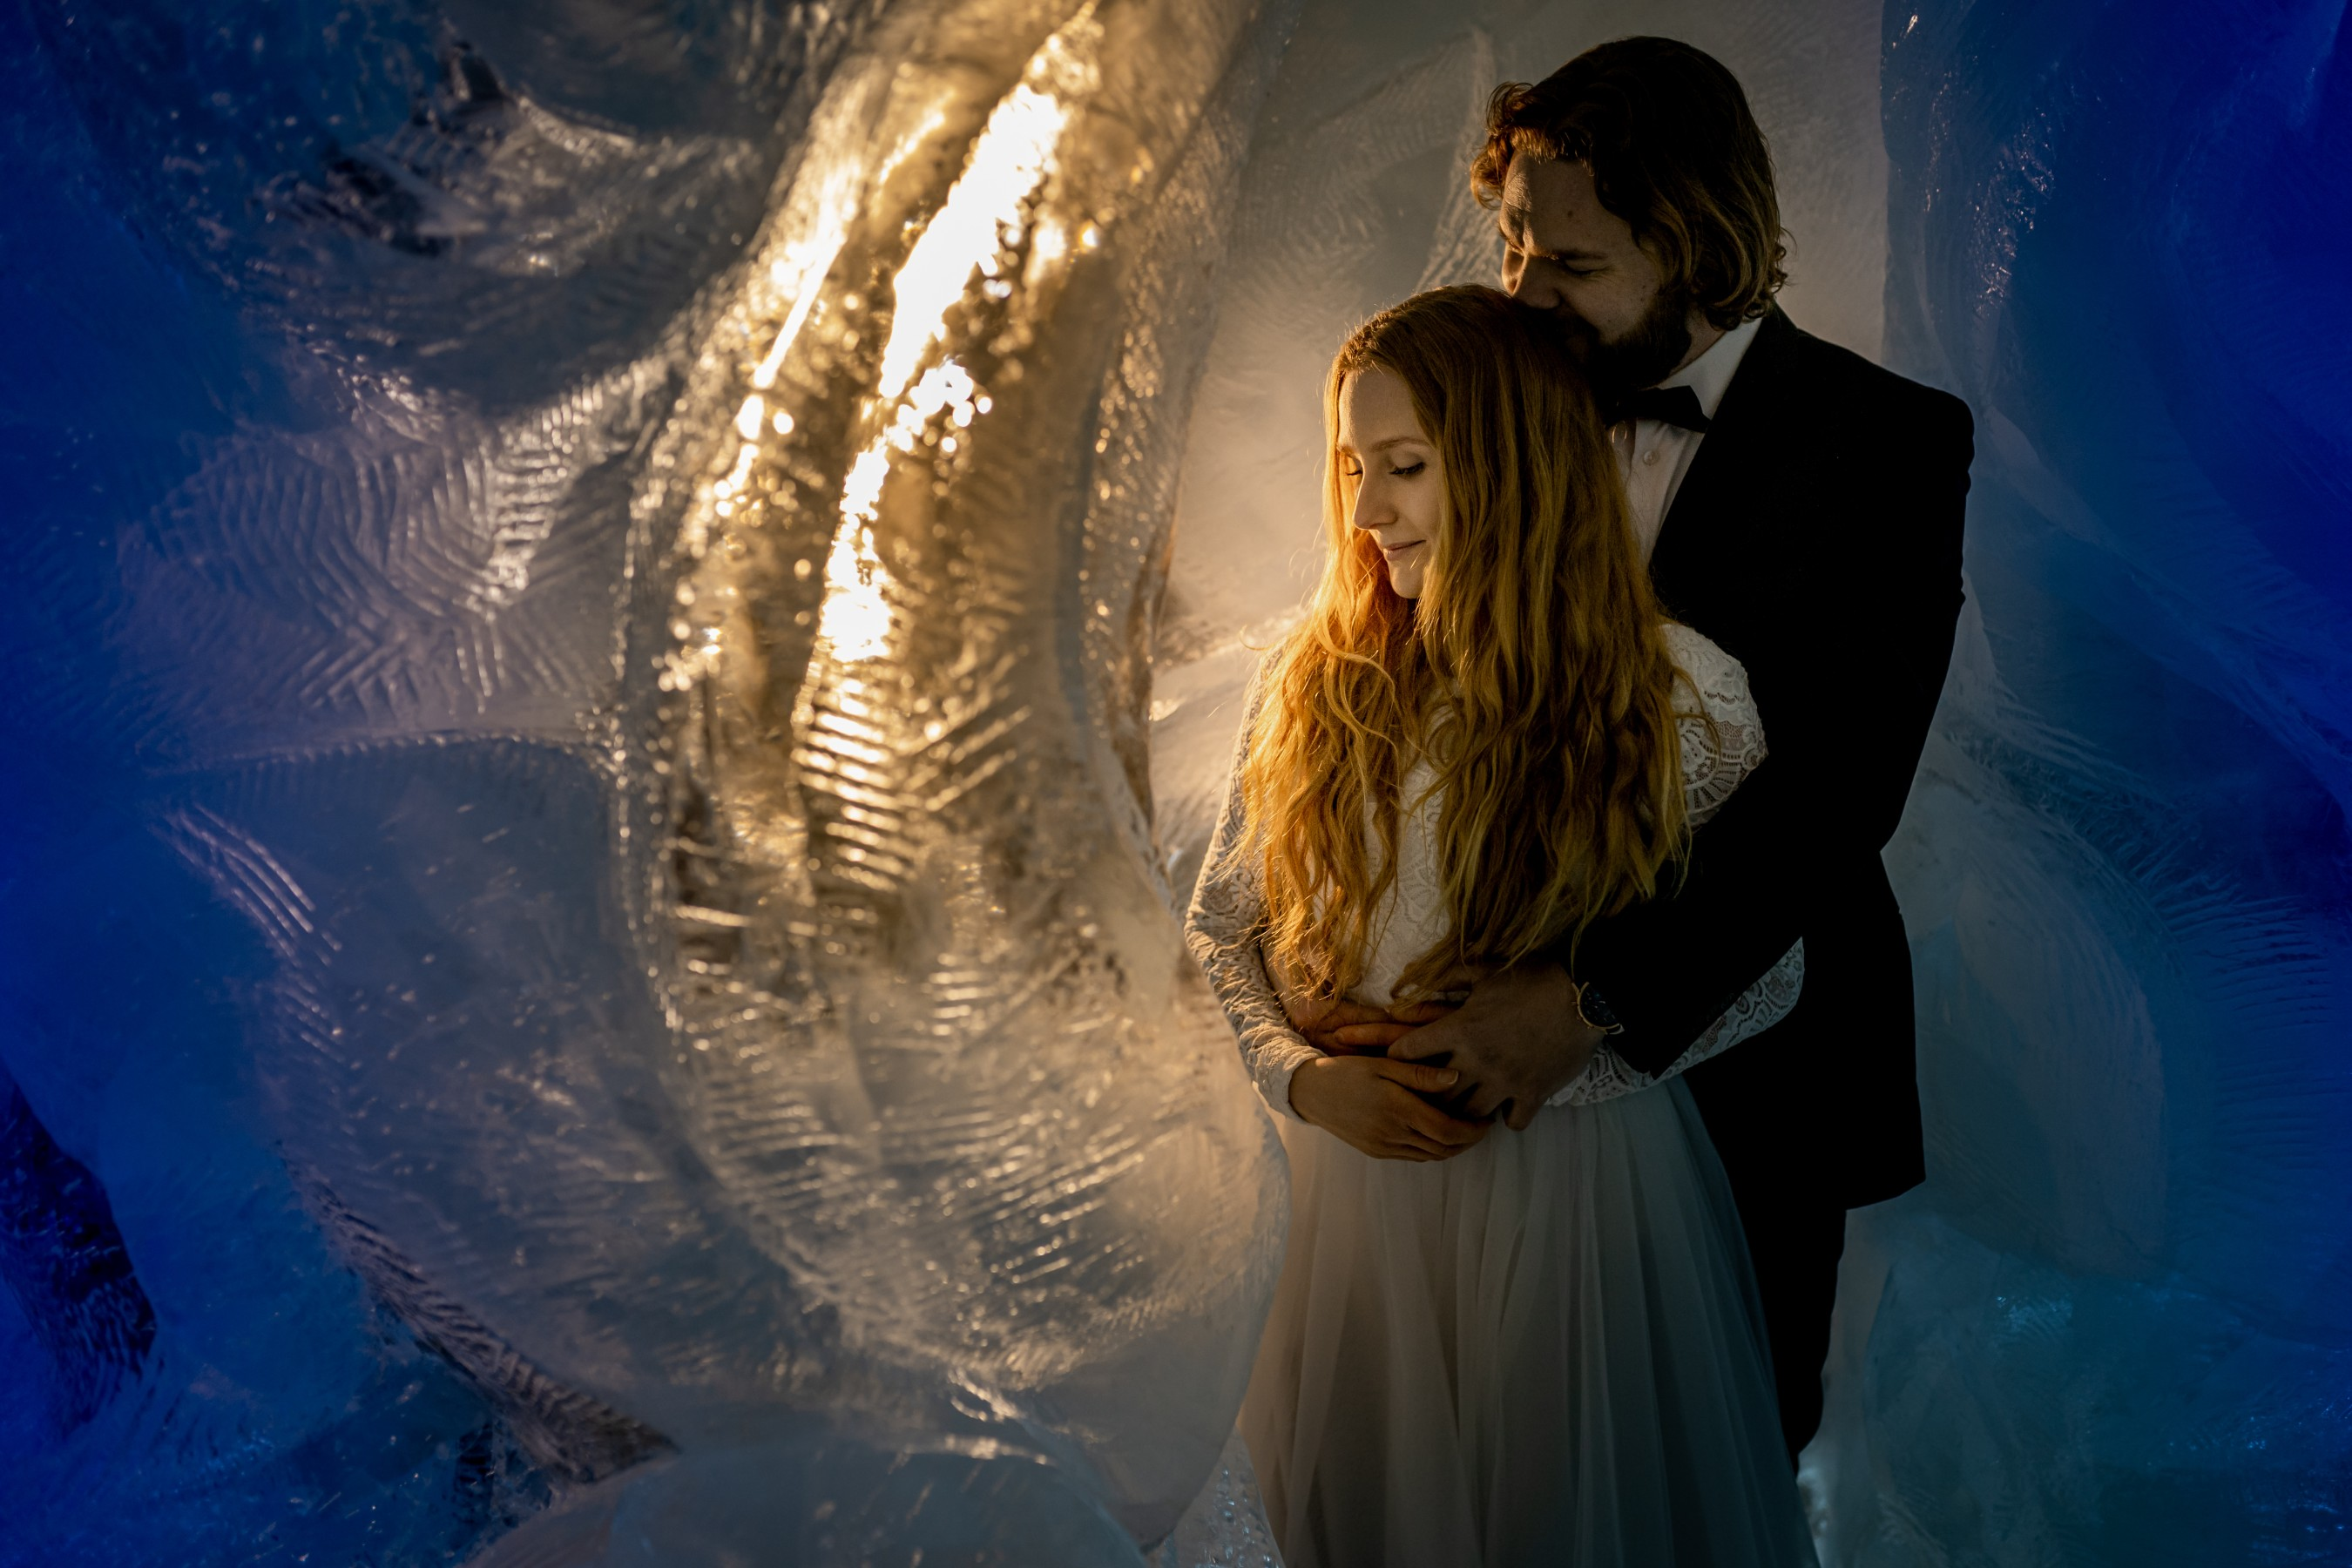 winter wedding at icehotel sweden - cinematic wedding photography - ice wedding - elopement in sweden - creative wedding photographer - unconventional wedding - alternative wedding - unique wedding - artistic wedding - ice hotel wedding